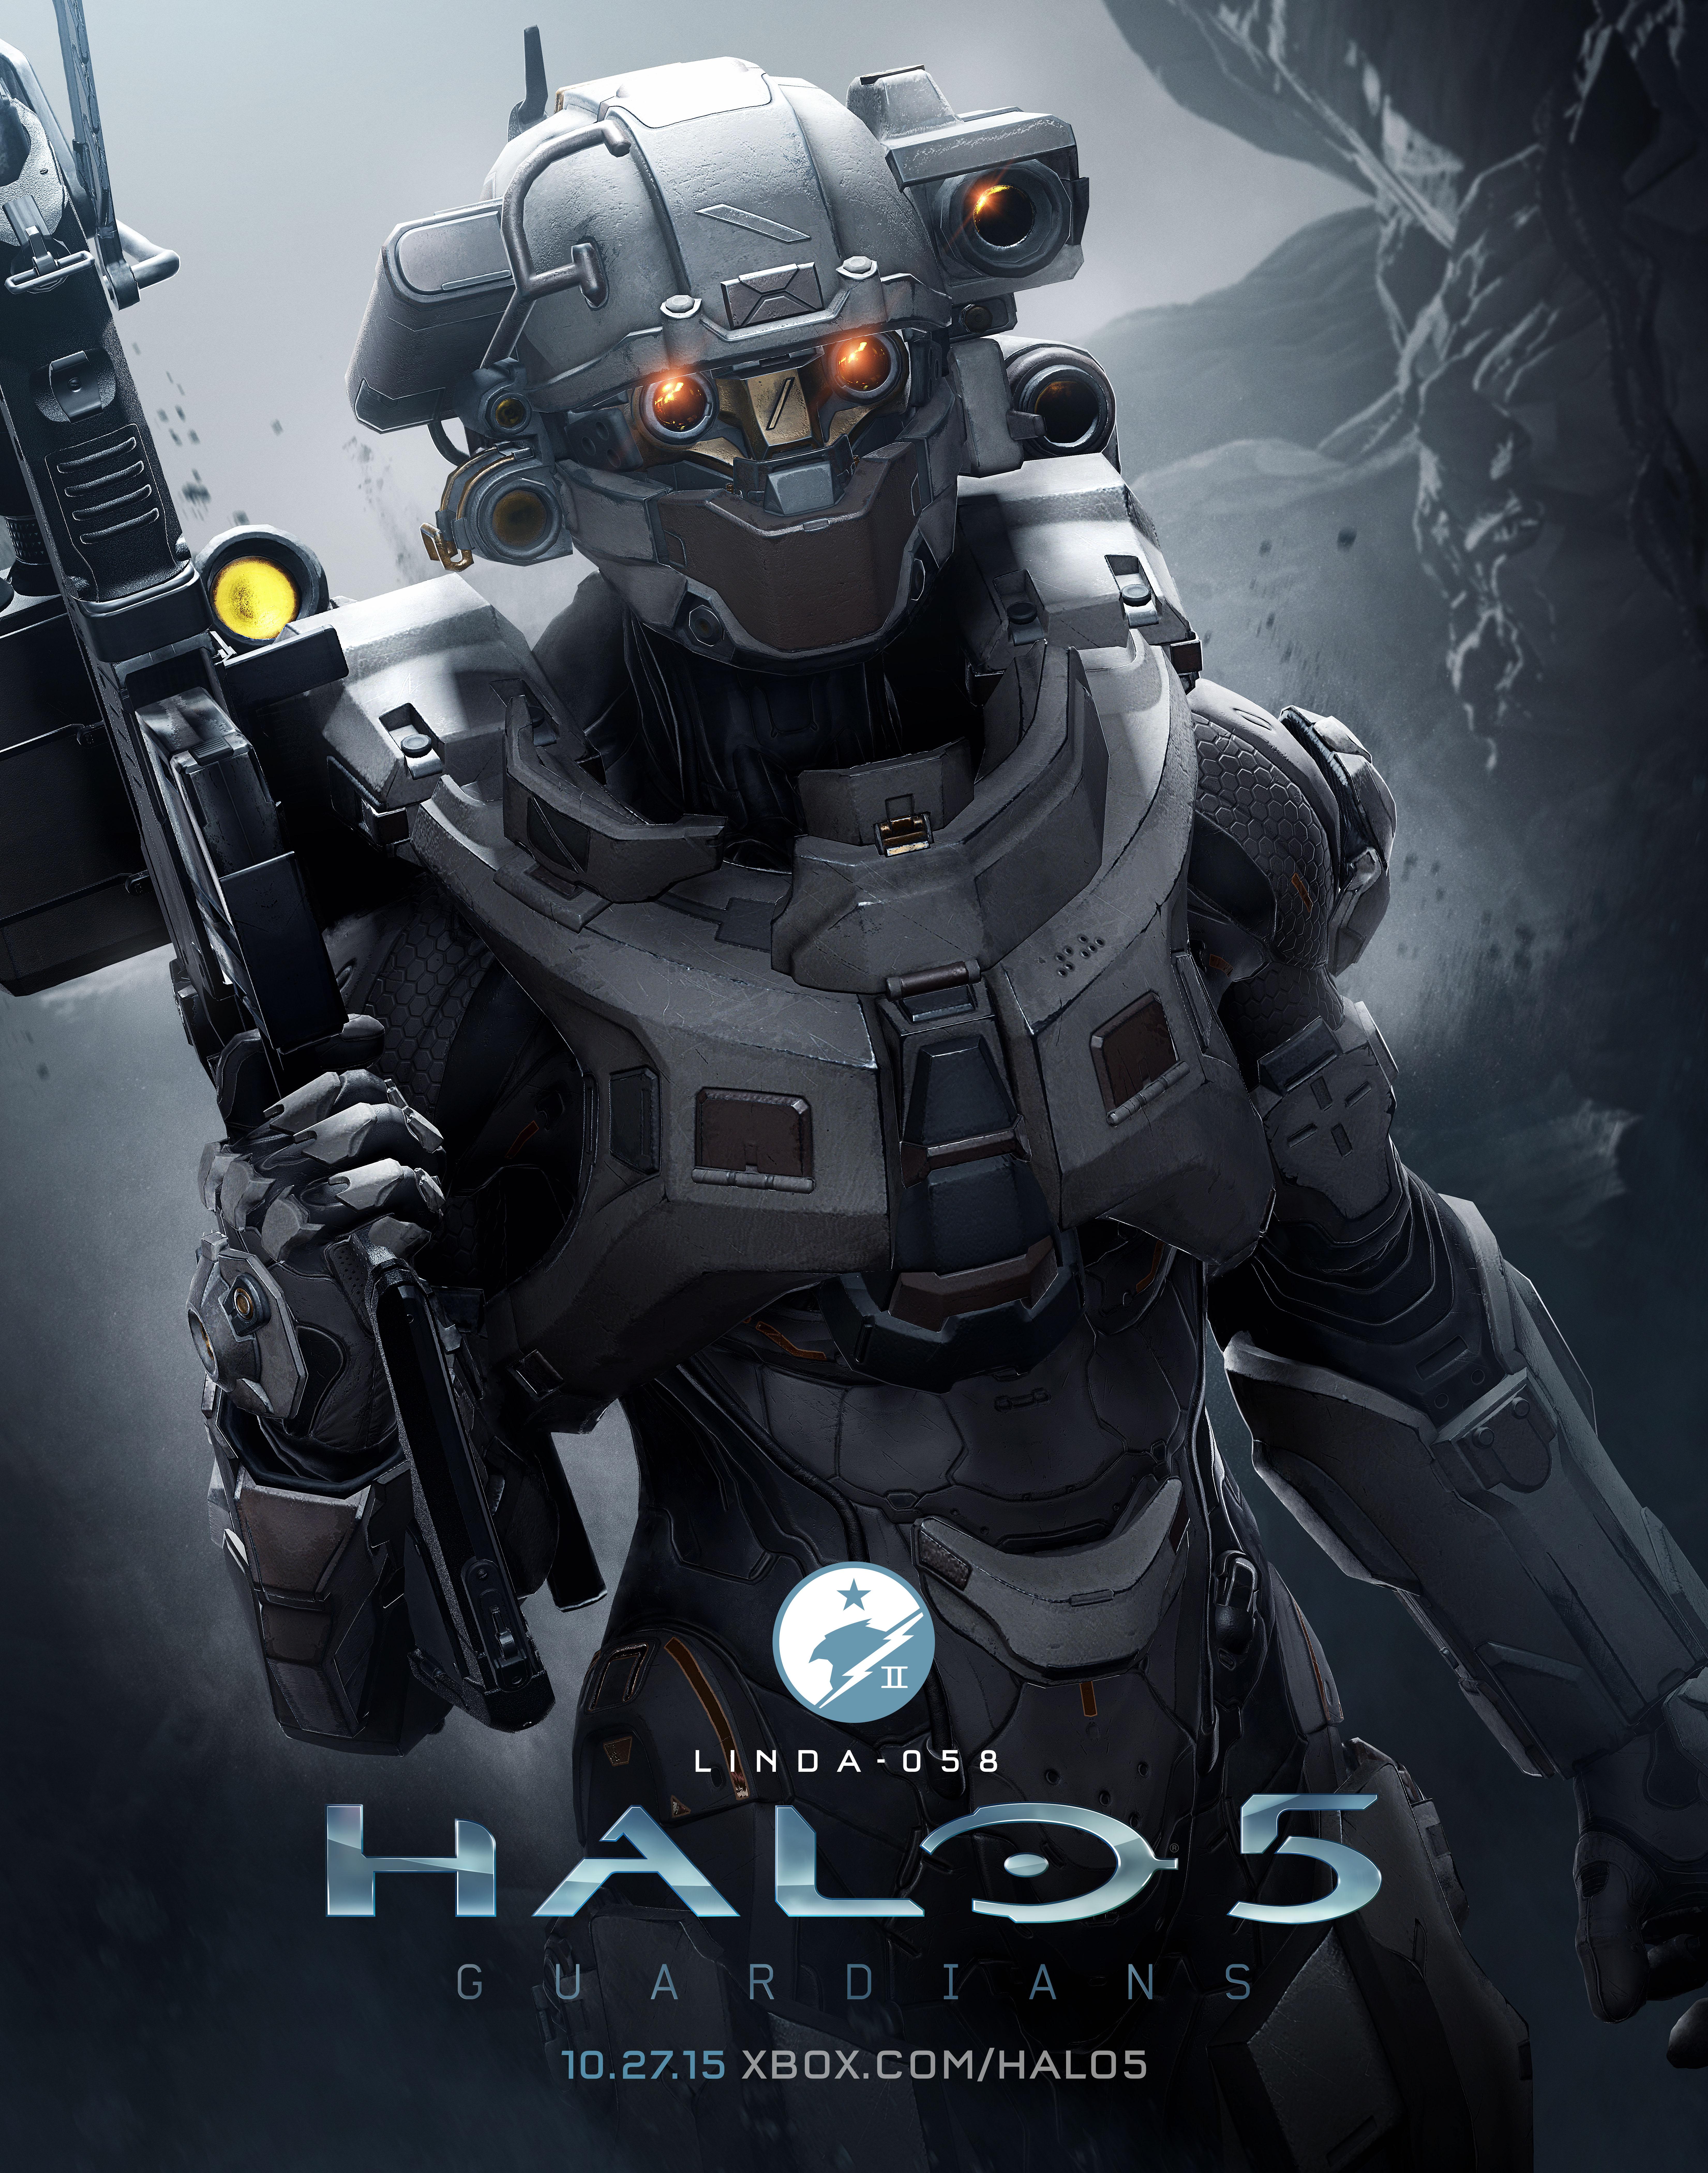 Halo 5 pics - Halo 5 screensaver ...